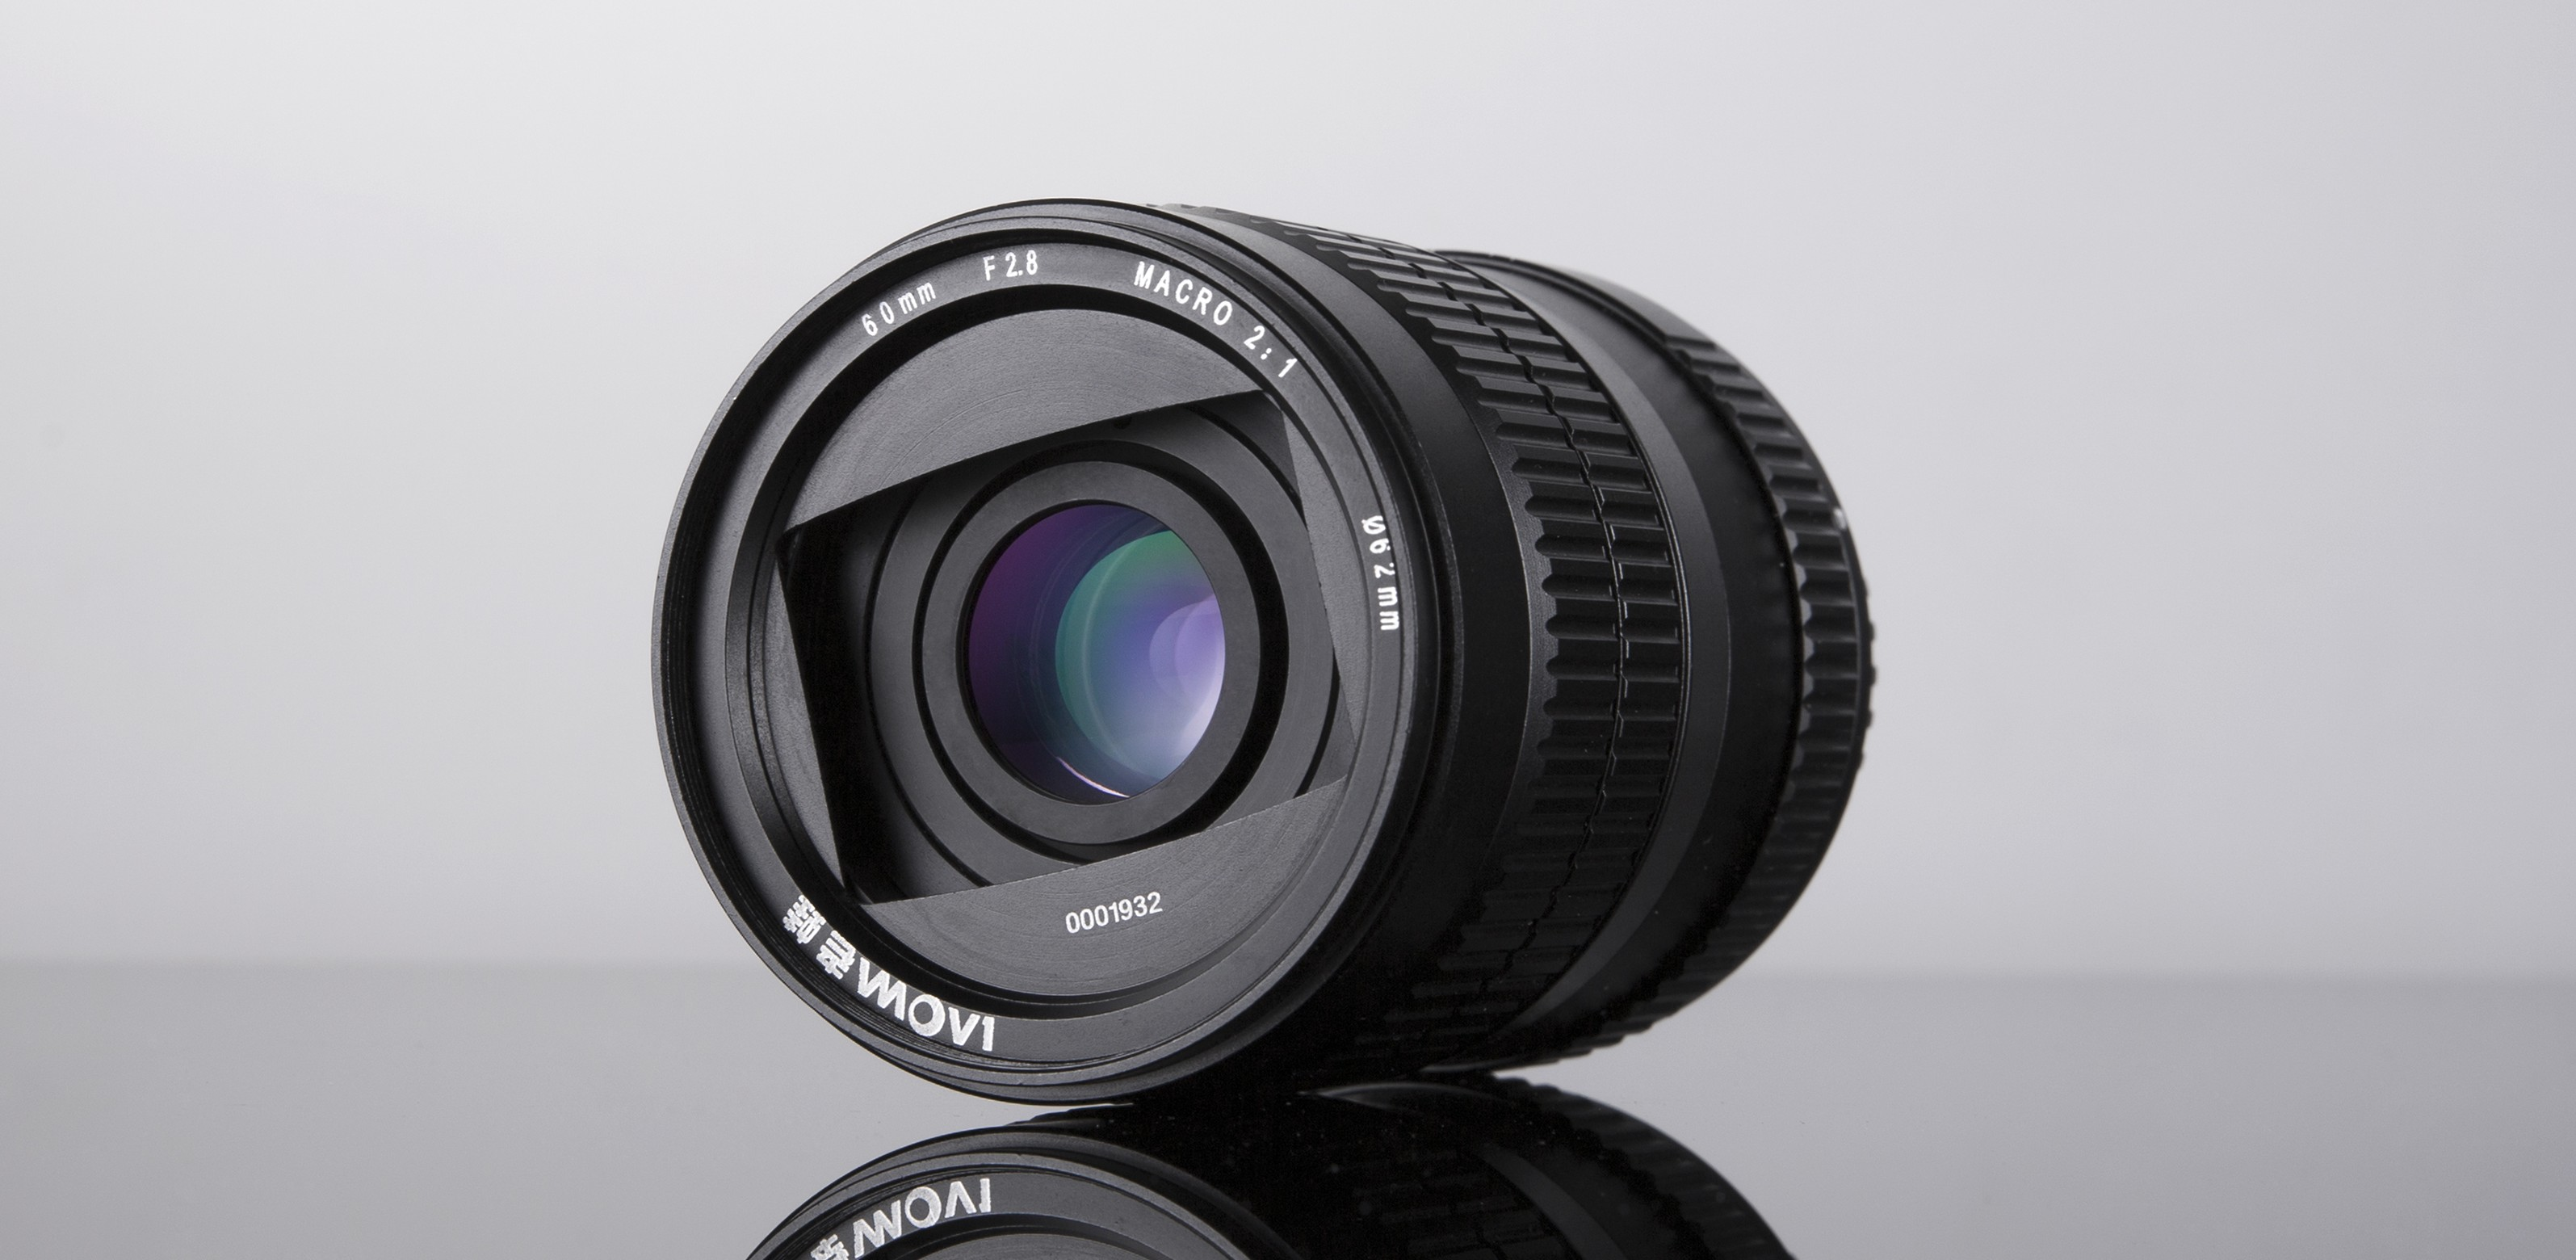 LAOWA 60mm f/2.8 Ultra-Macro Lens